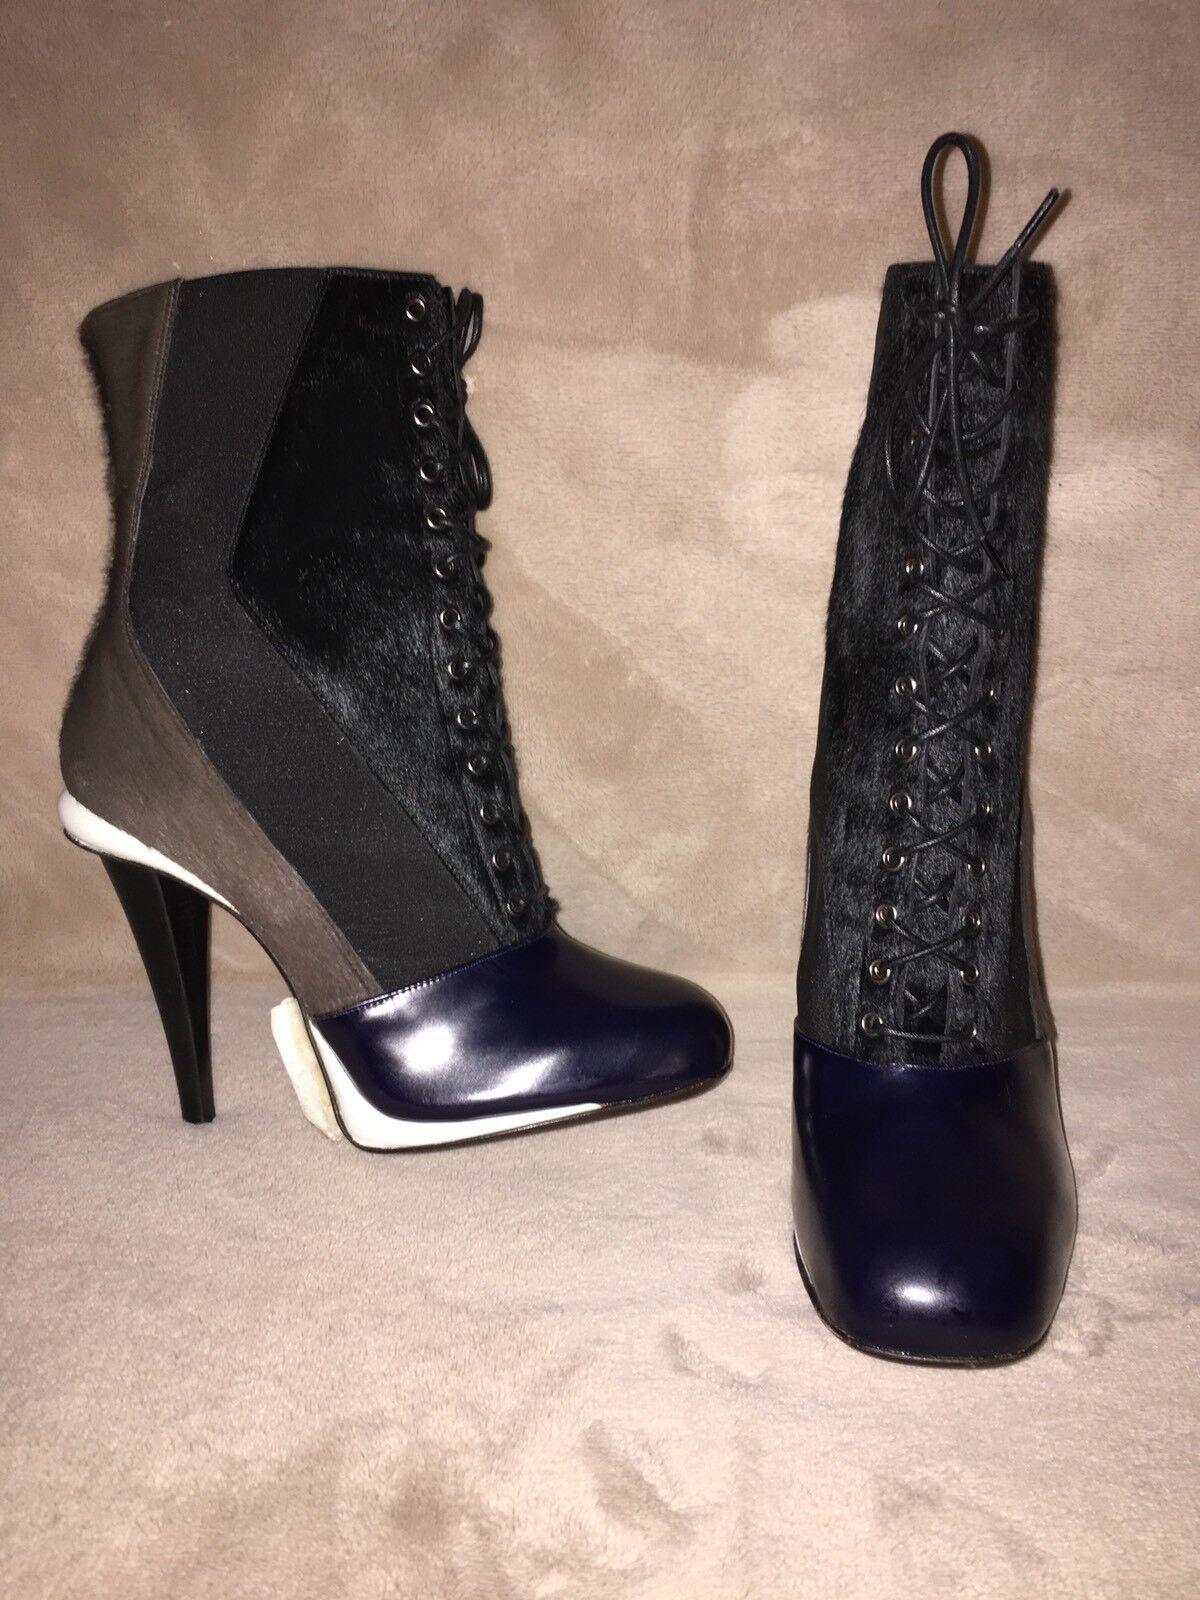 NEW Fendi Boots Sz 39.5